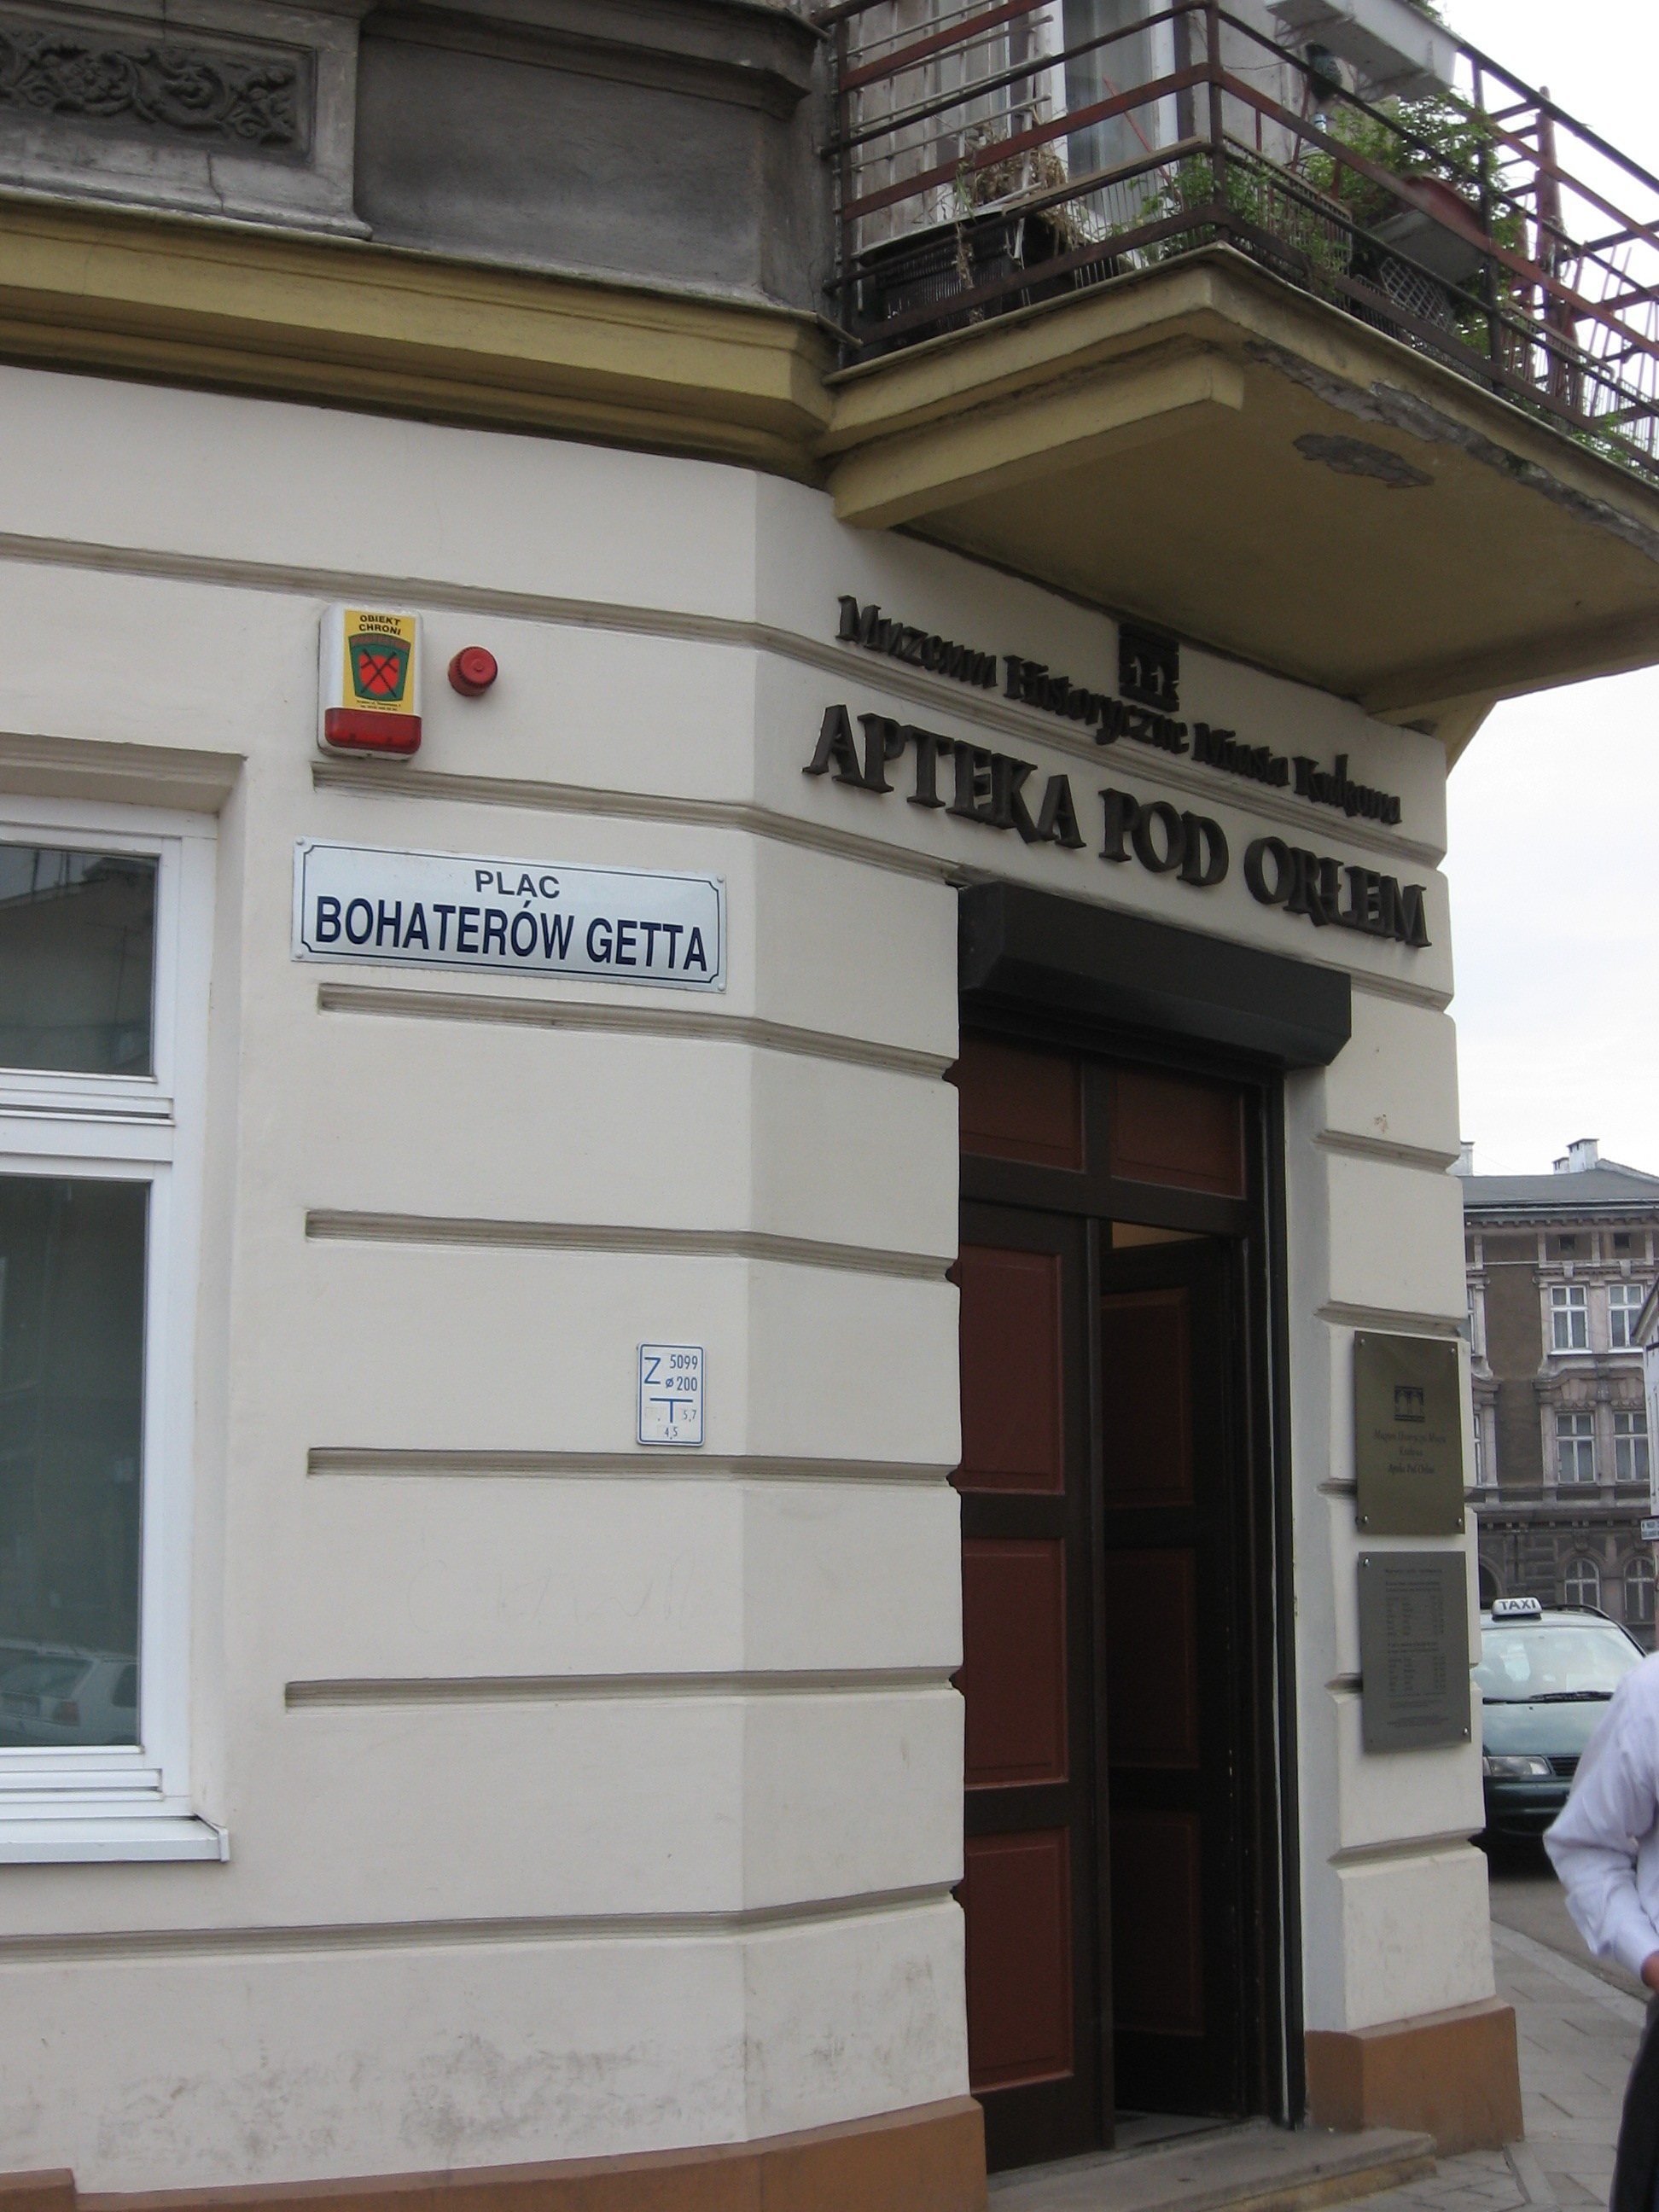 Apotheke-zum-Adler-Ghetto